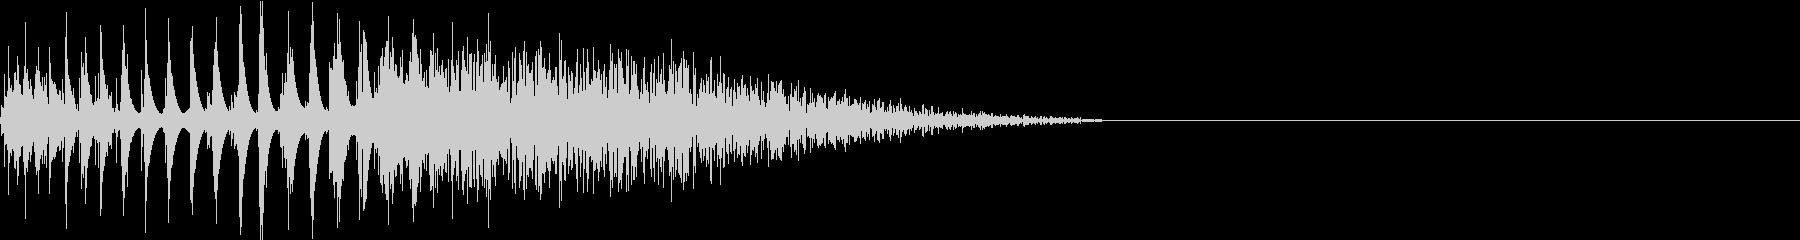 DTM Snare 1 オリジナル音源の未再生の波形